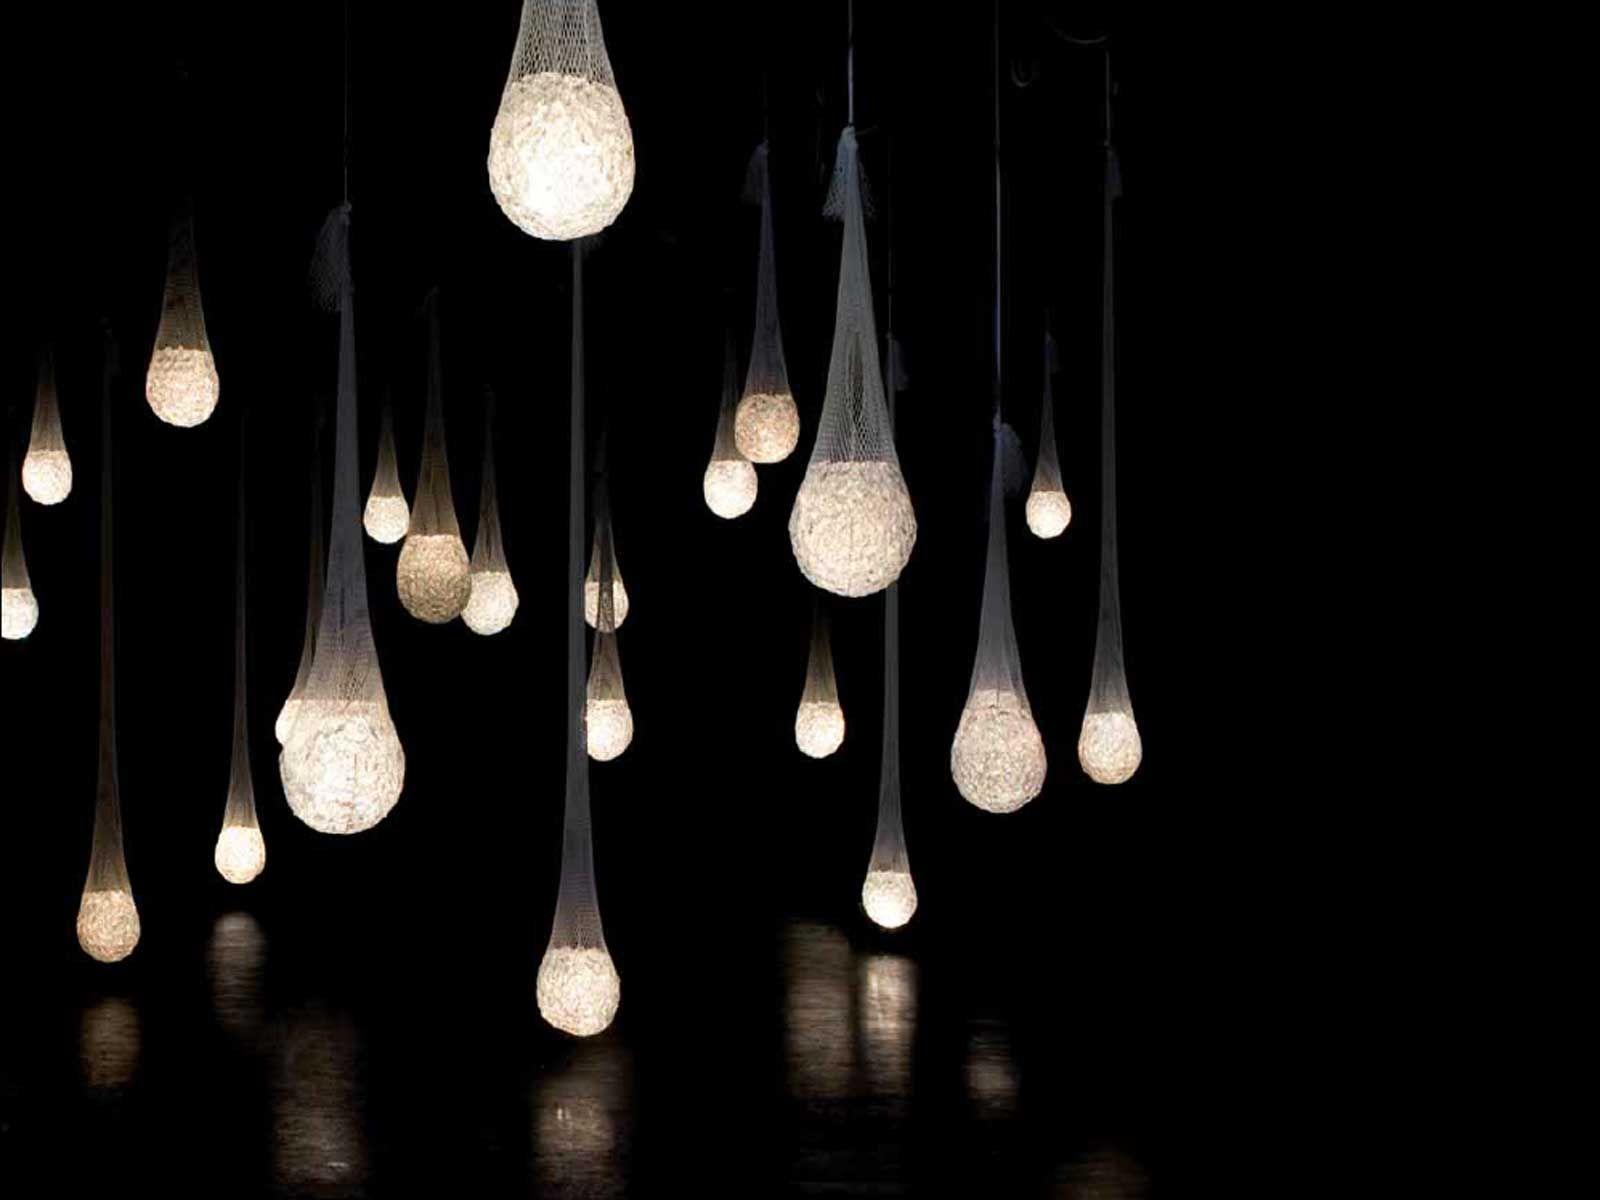 17 Best images about SWAROVSKI LIGHTING on Pinterest   Ceiling lamps, Swarovski  crystals and Teak